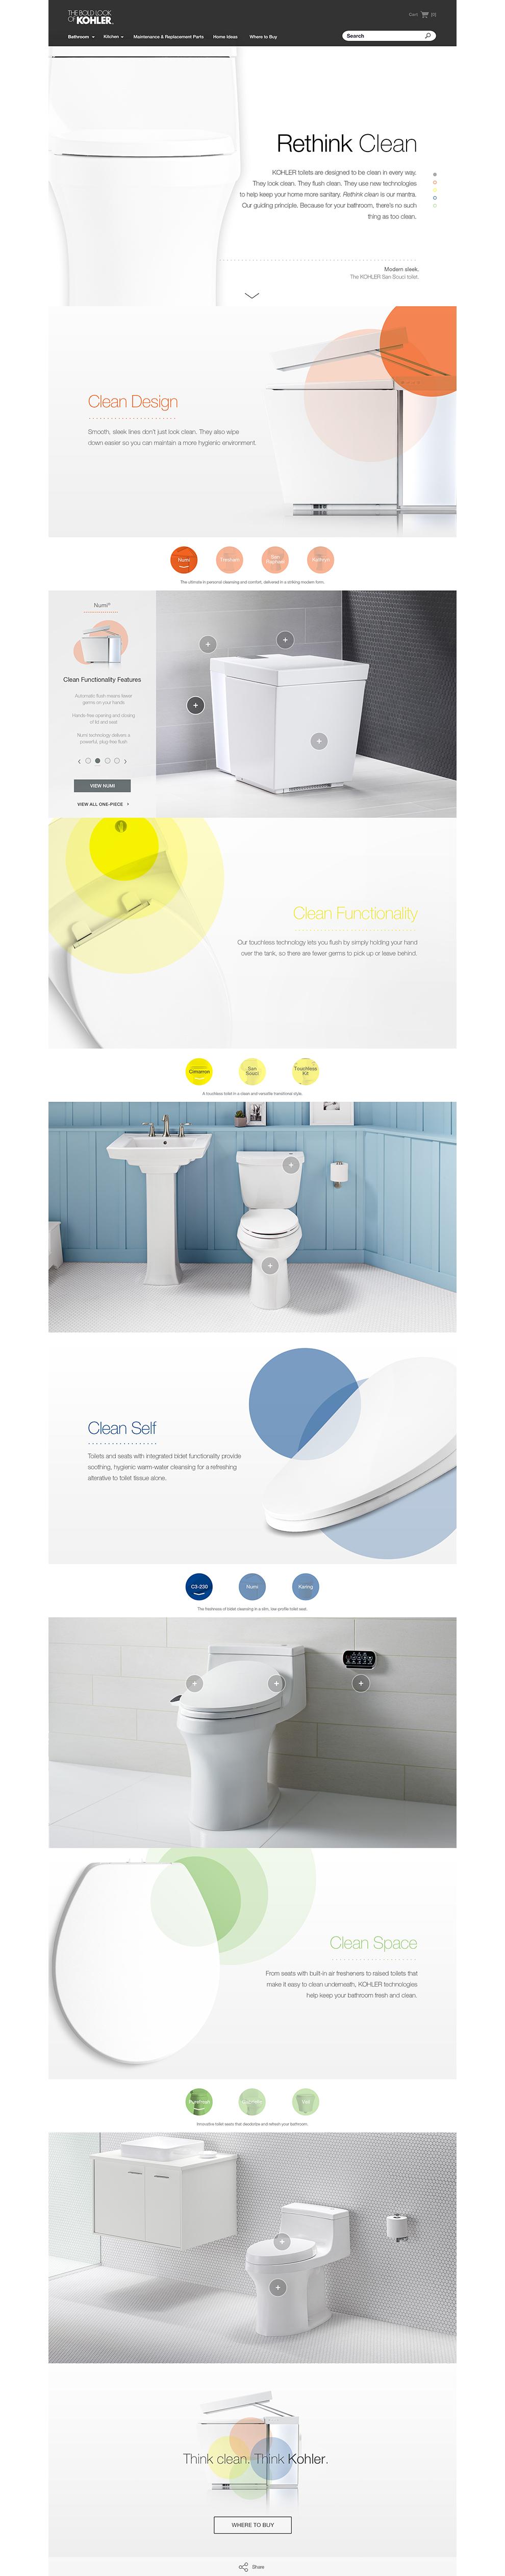 Kohler_ToiletLeadership_FINAL_990px.jpg